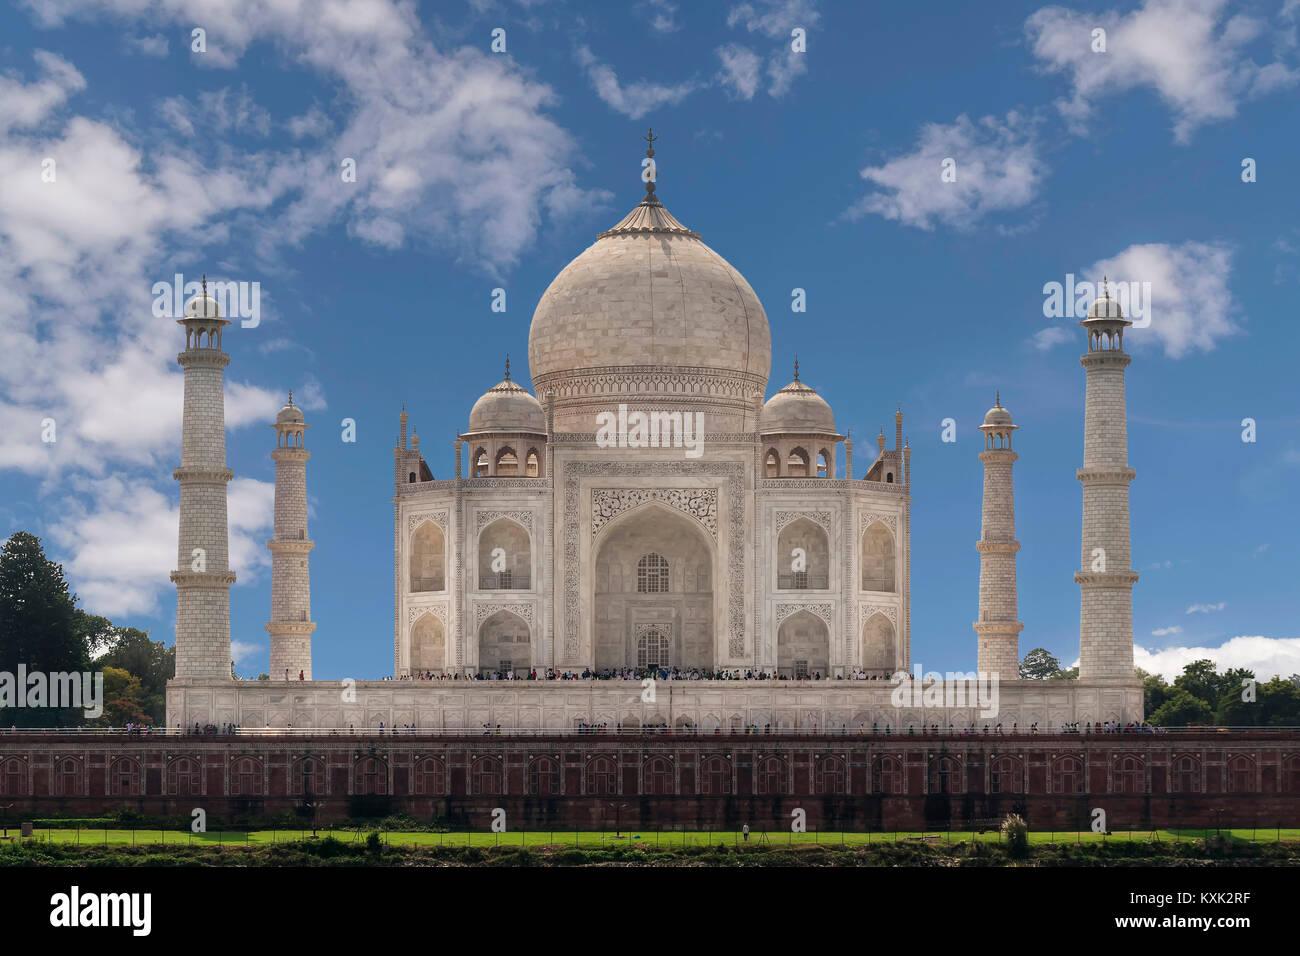 Taj Mahal desde el río Yamuna, Agra, Uttar Pradesh, India Imagen De Stock